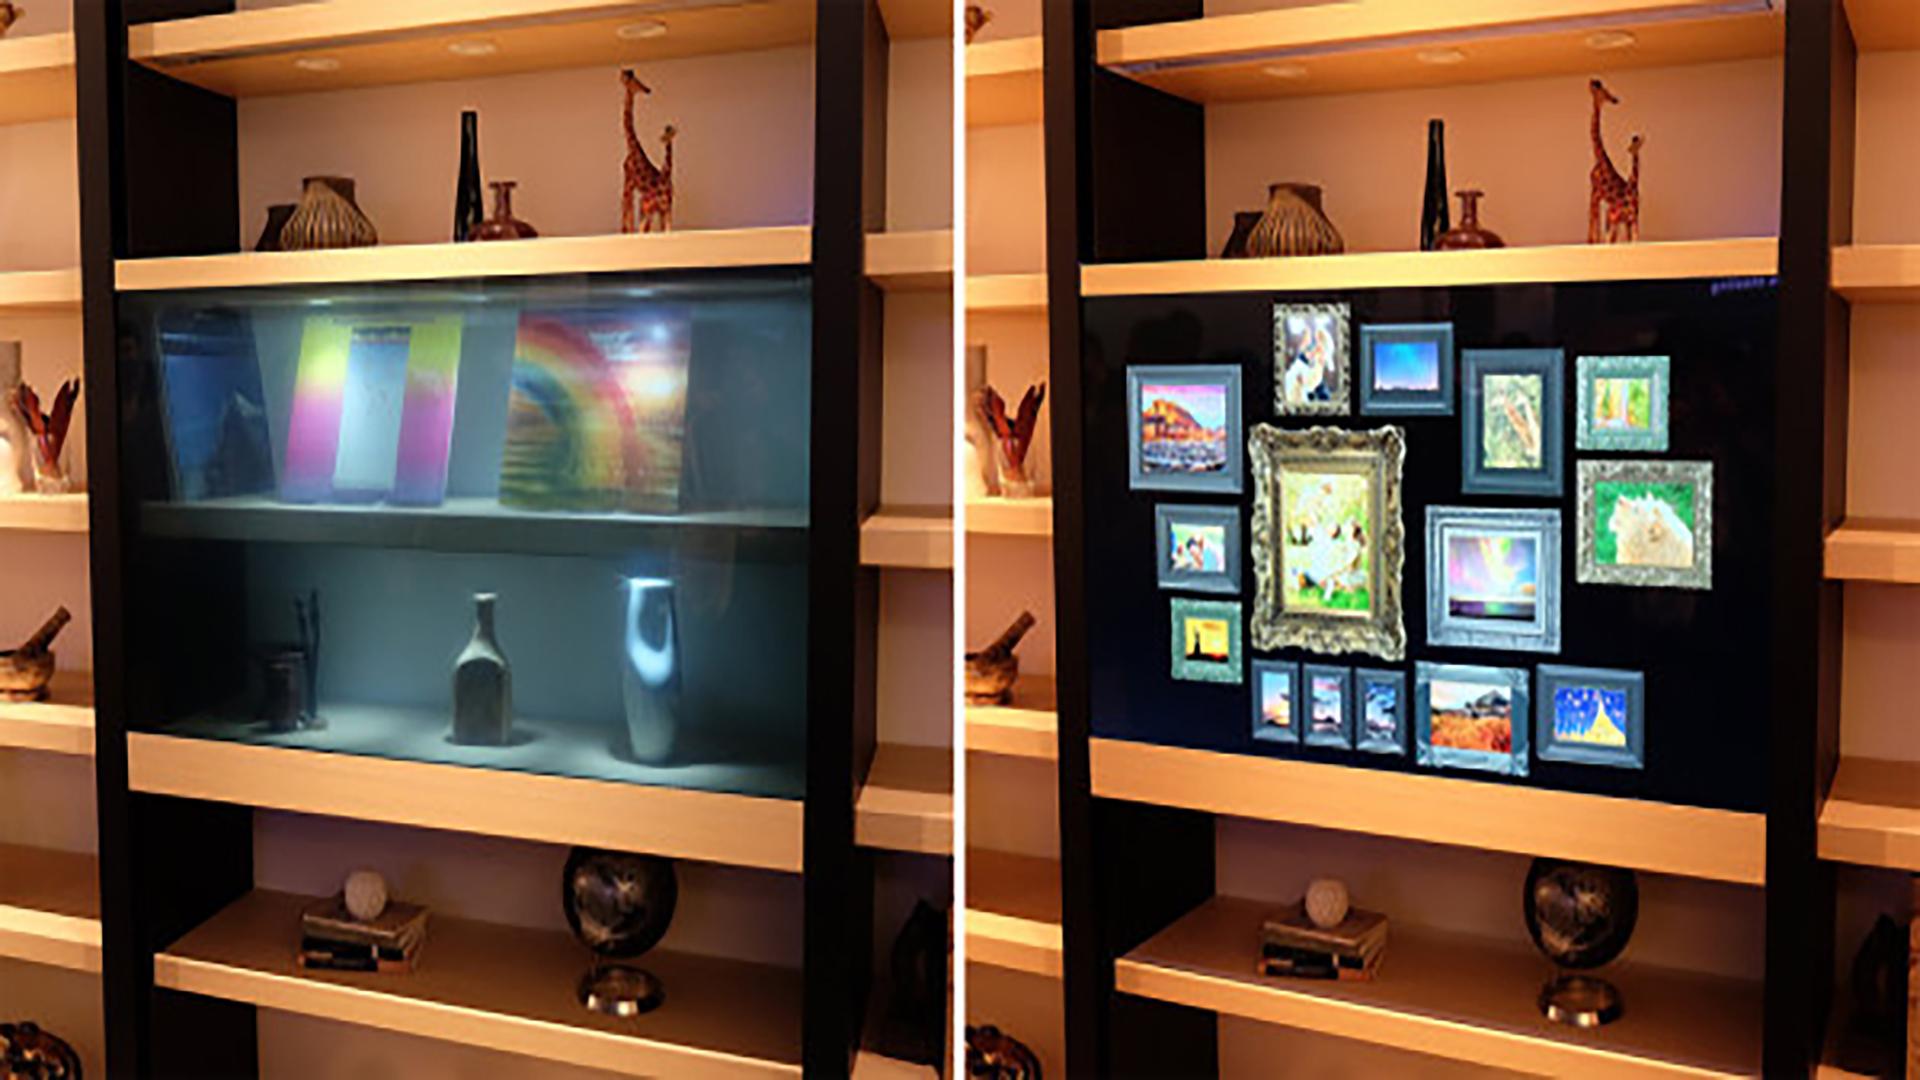 Panasonic Transparent Tv Mounted In Bookshelf January 2016